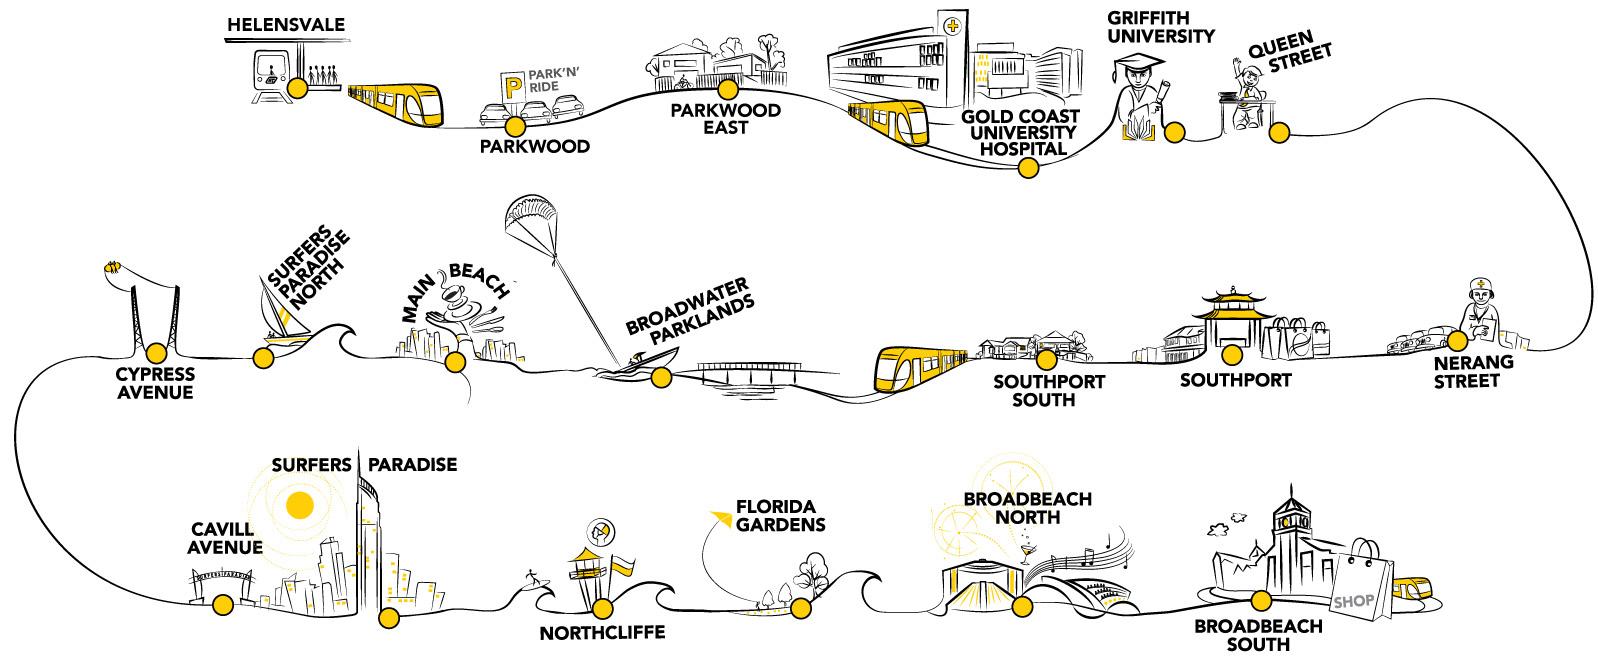 Glink Gold Coast Light Rail Tram Network